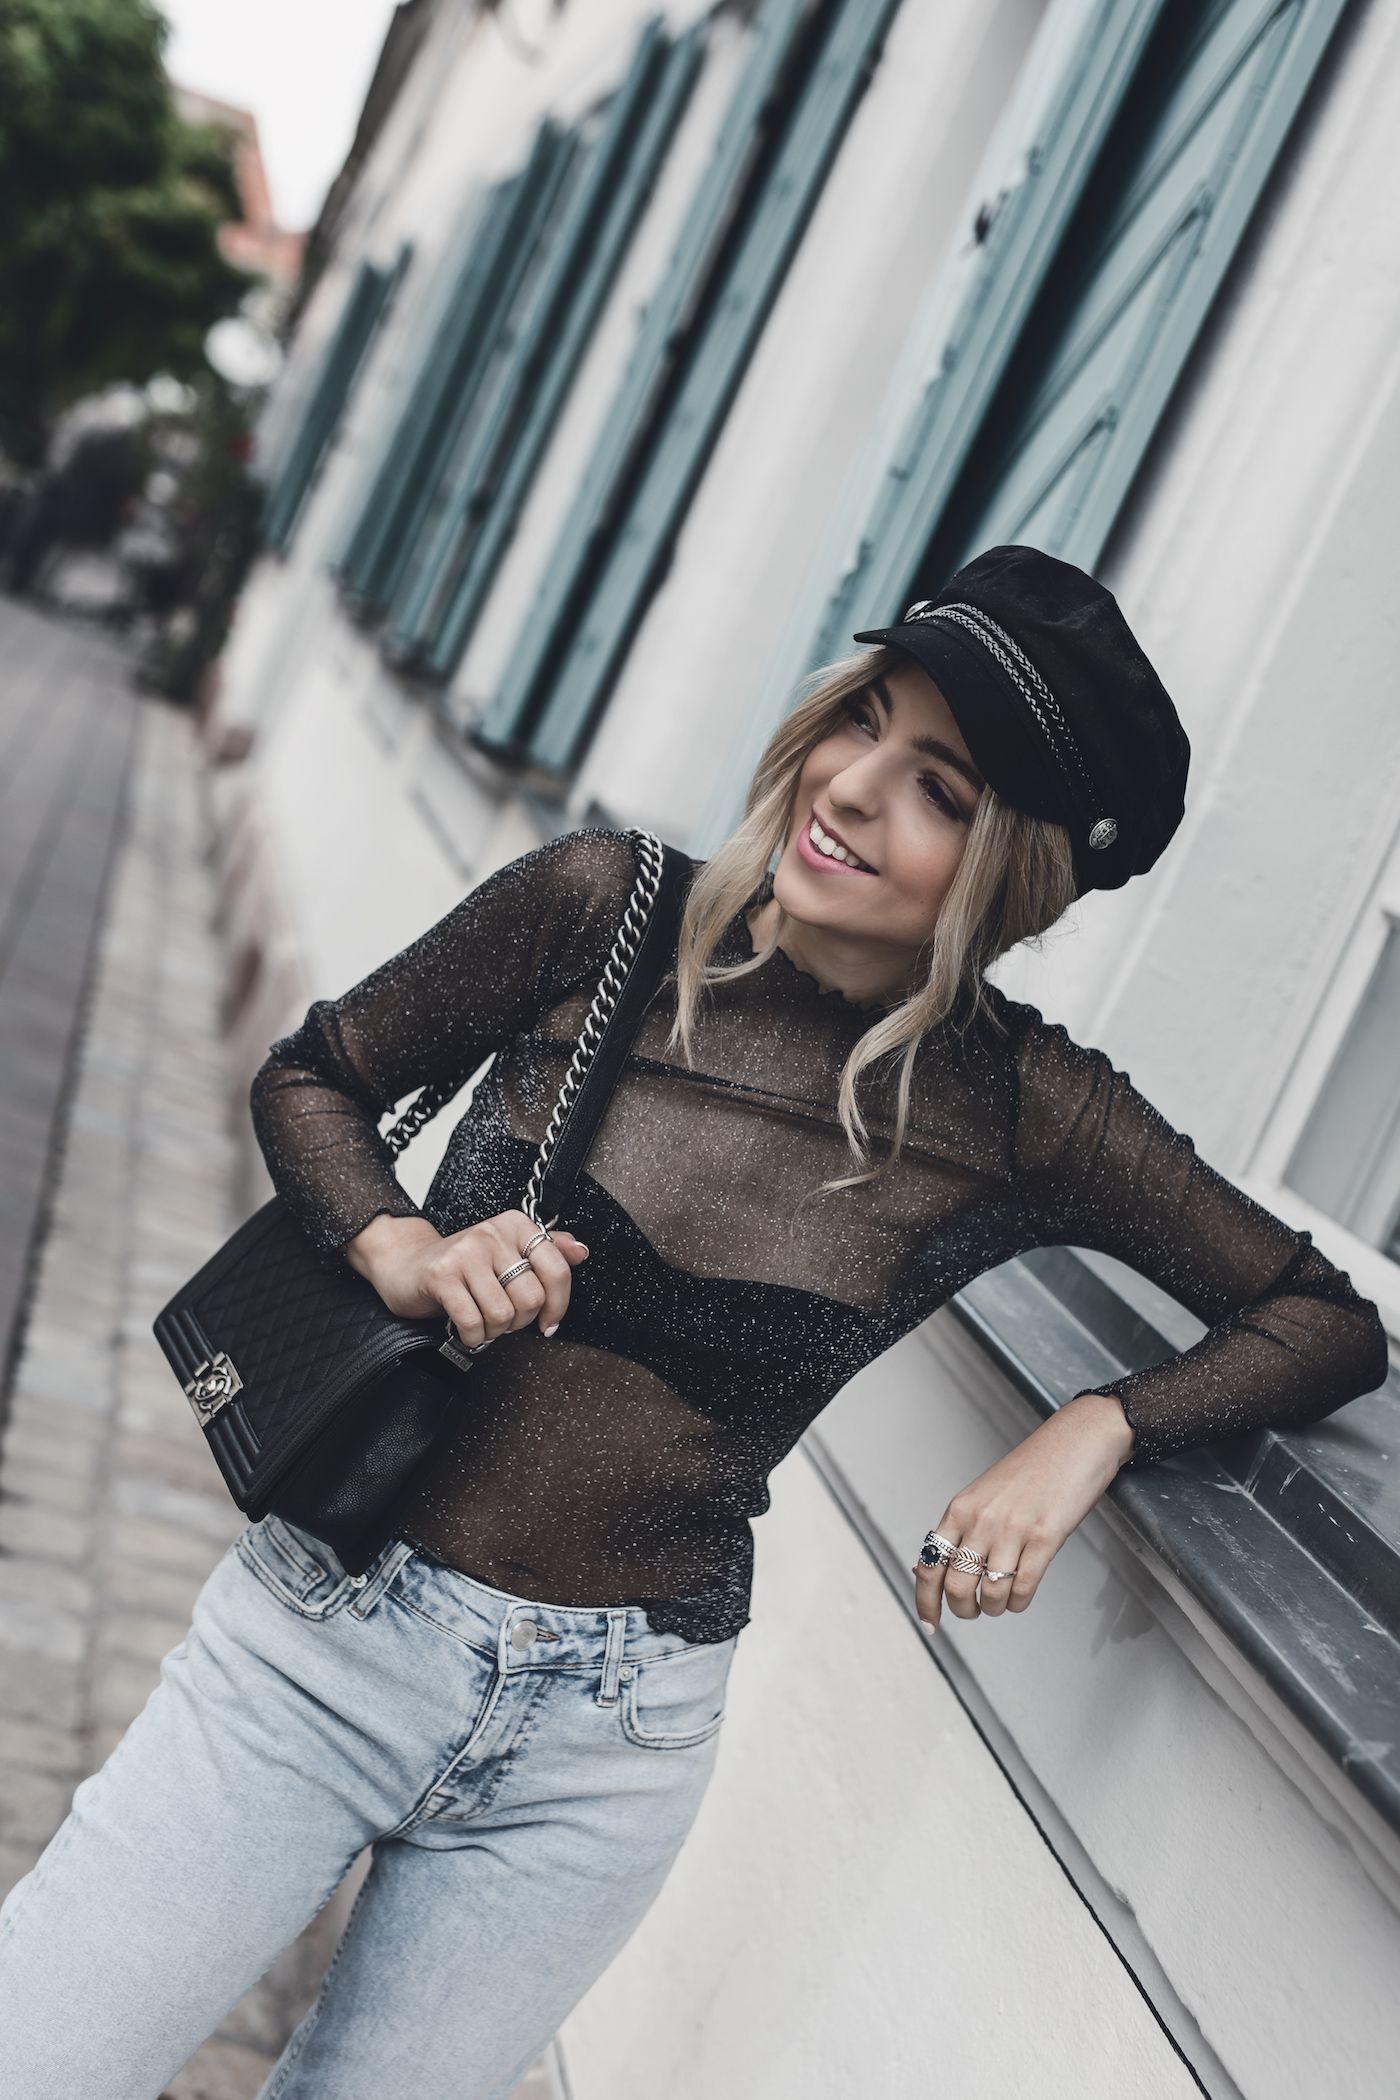 5 baker boy hat outfit ideas   street style 2017, casual winter